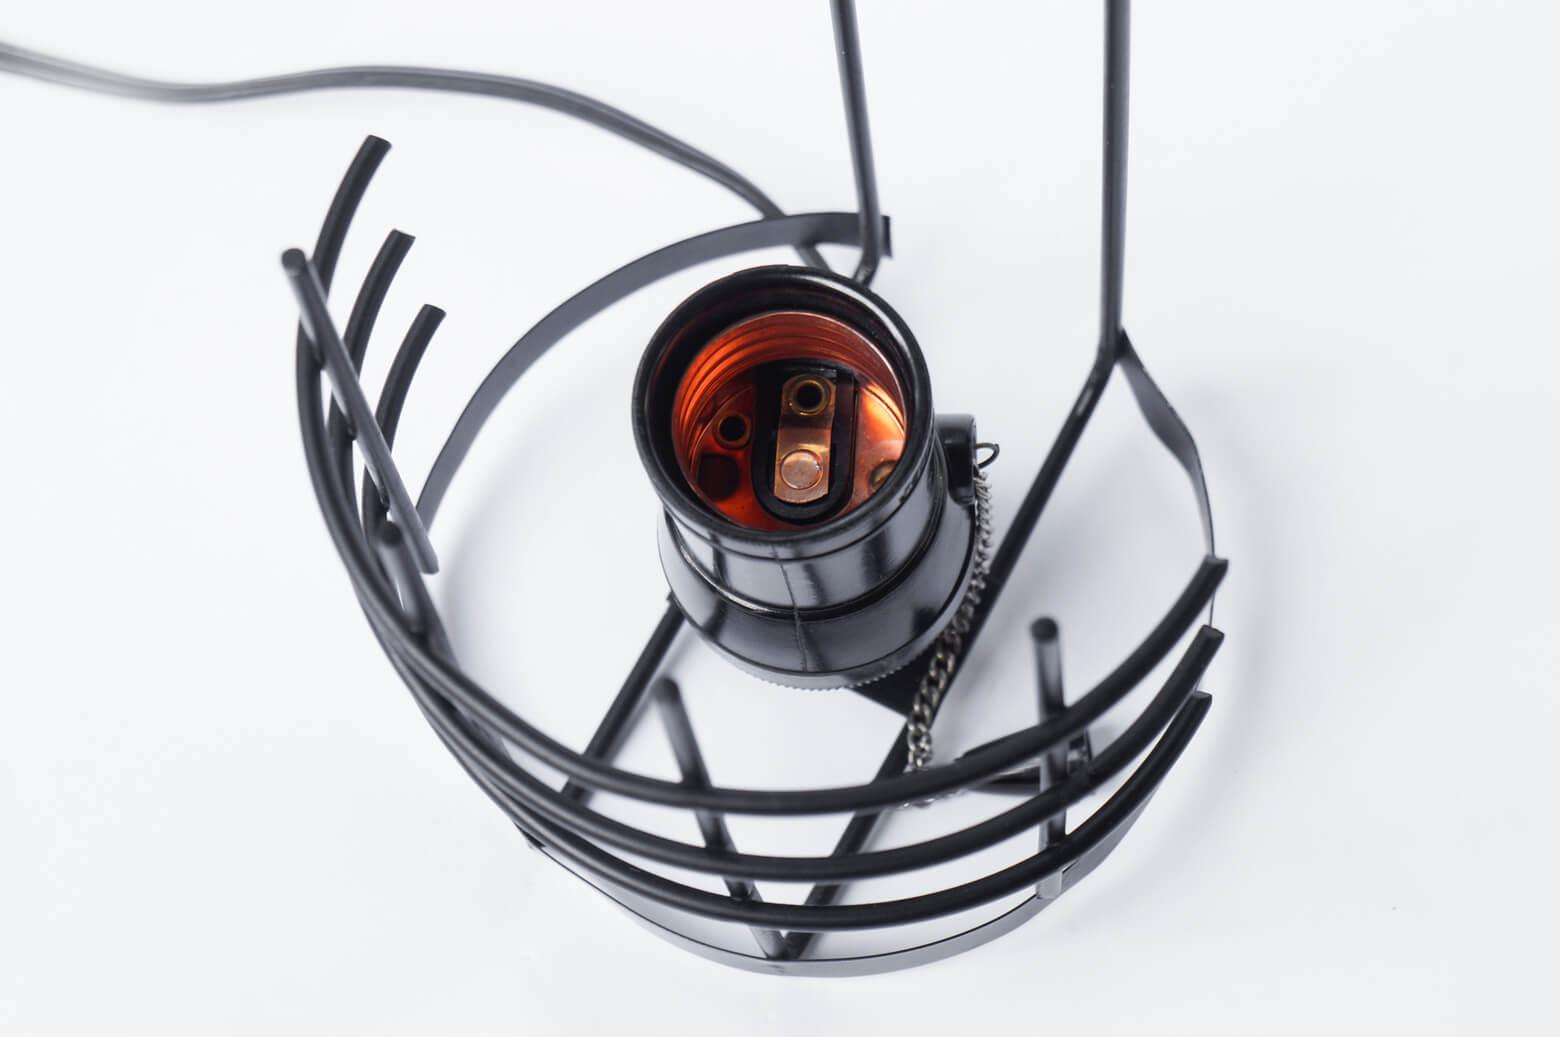 Vintage steel cage glass shade wall lamp / 壁掛け スチール フレーム ガラス シェード ウォール ランプ